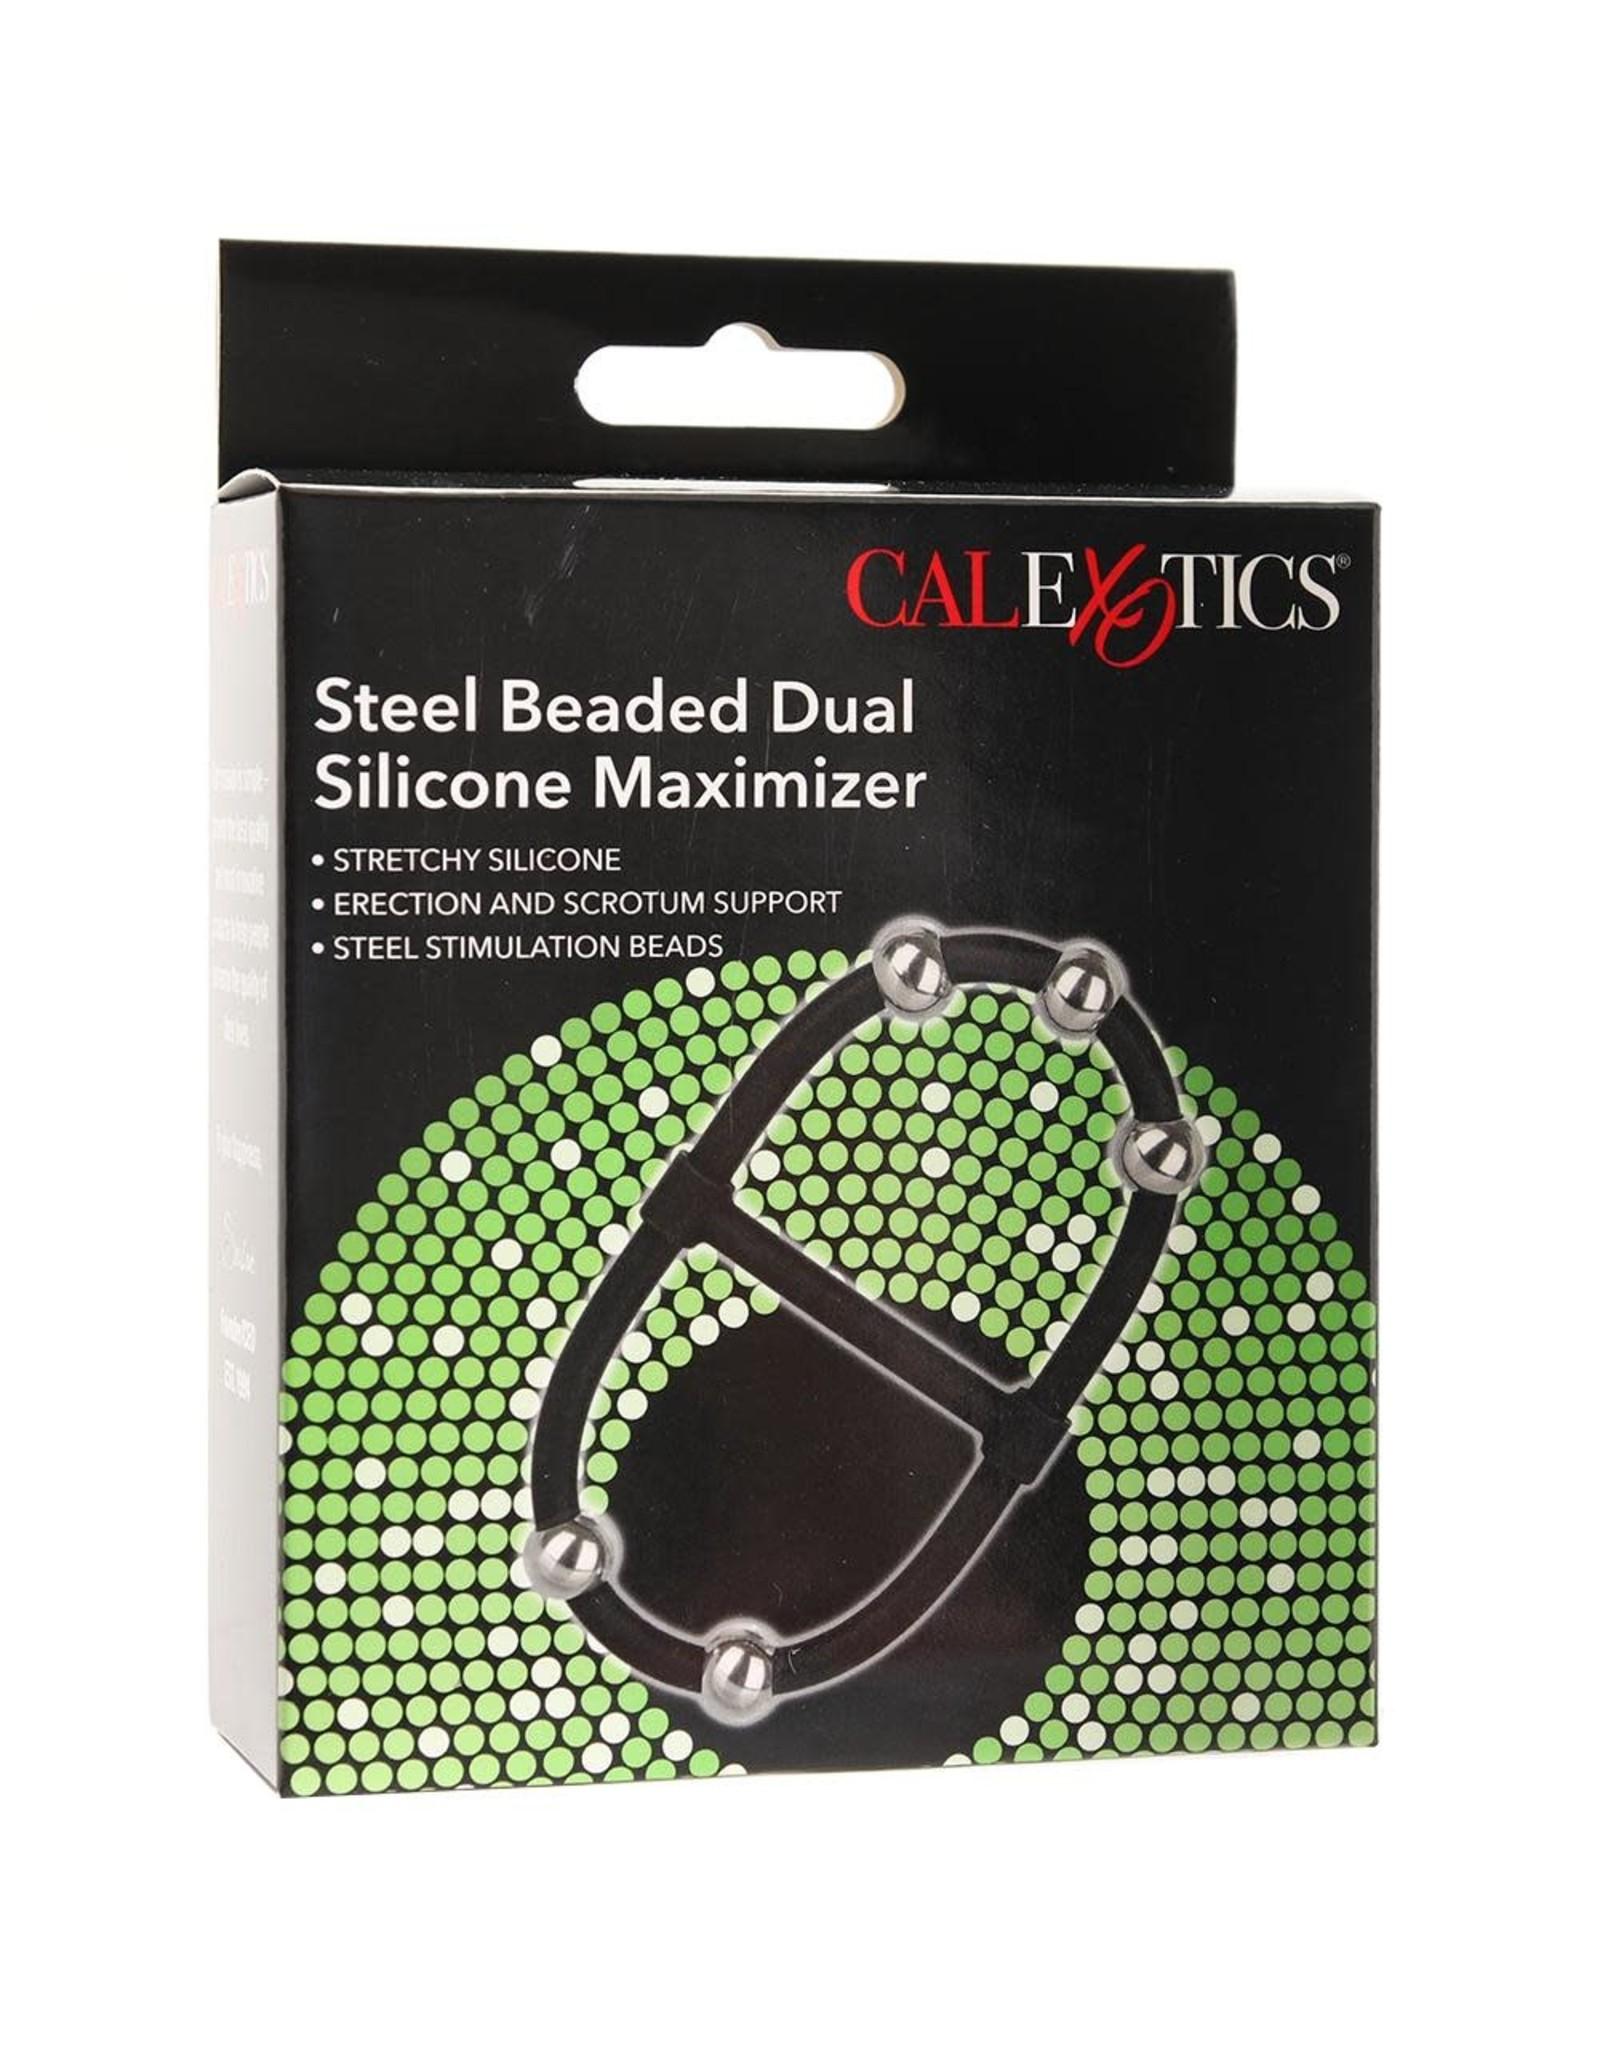 CALEXOTICS CALEXOTICS - STEEL BEADED DUAL SILICONE MAXIMIZER